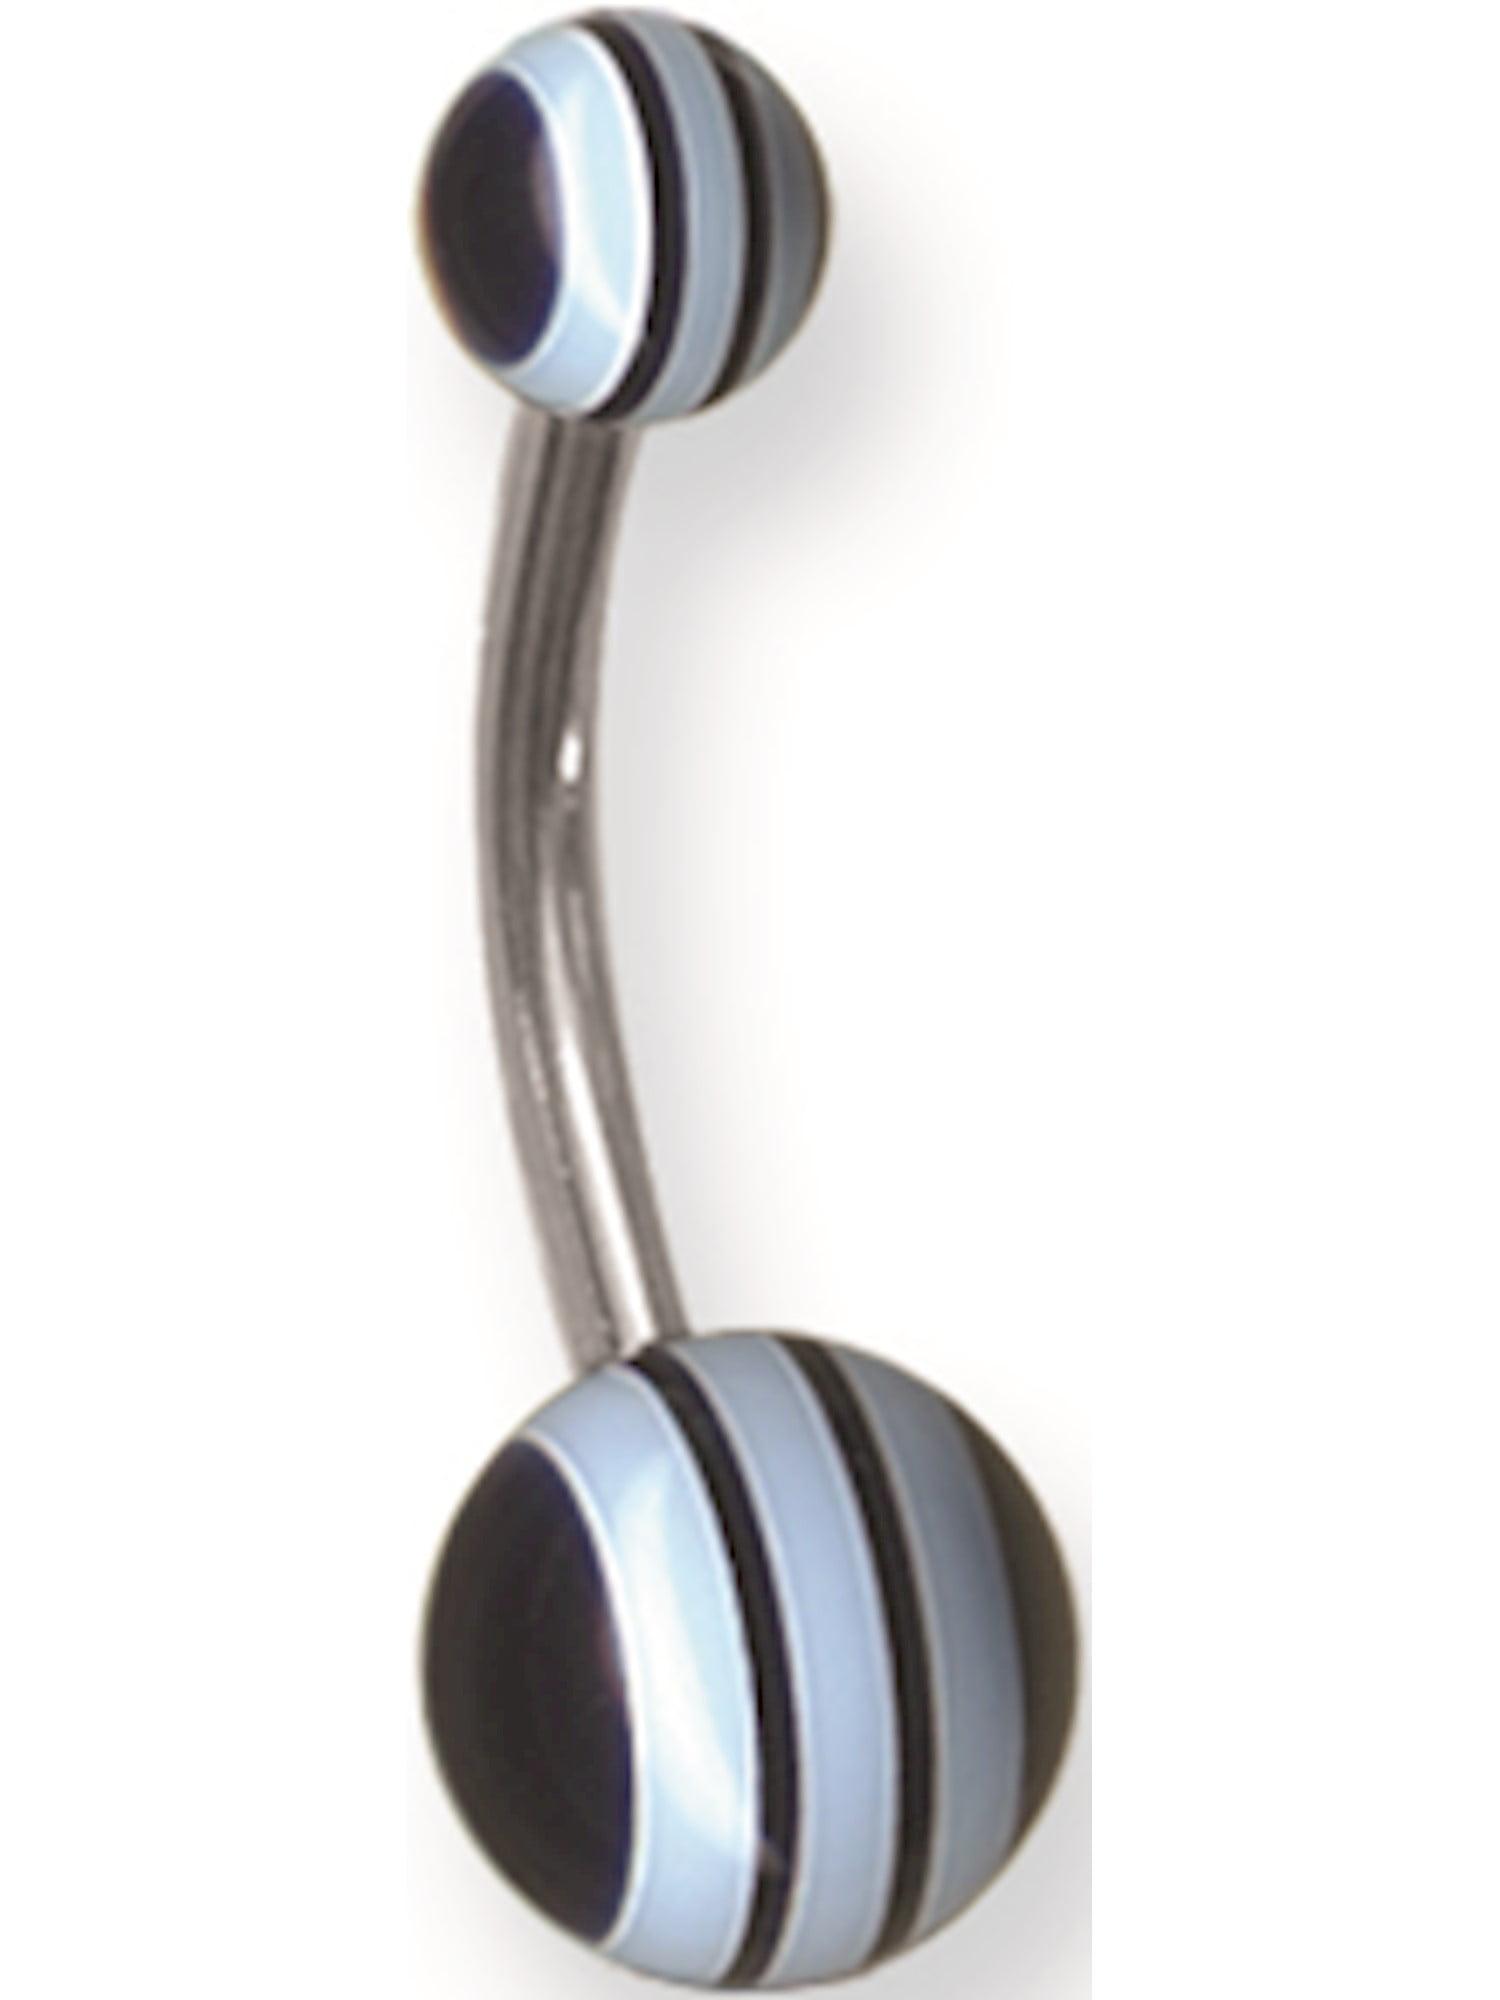 12mm 7//16 Dia w 4mm Balls Cobalt B Jewelry by Sweet Pea Solid Titanium Circ BB 14G 1.6mm